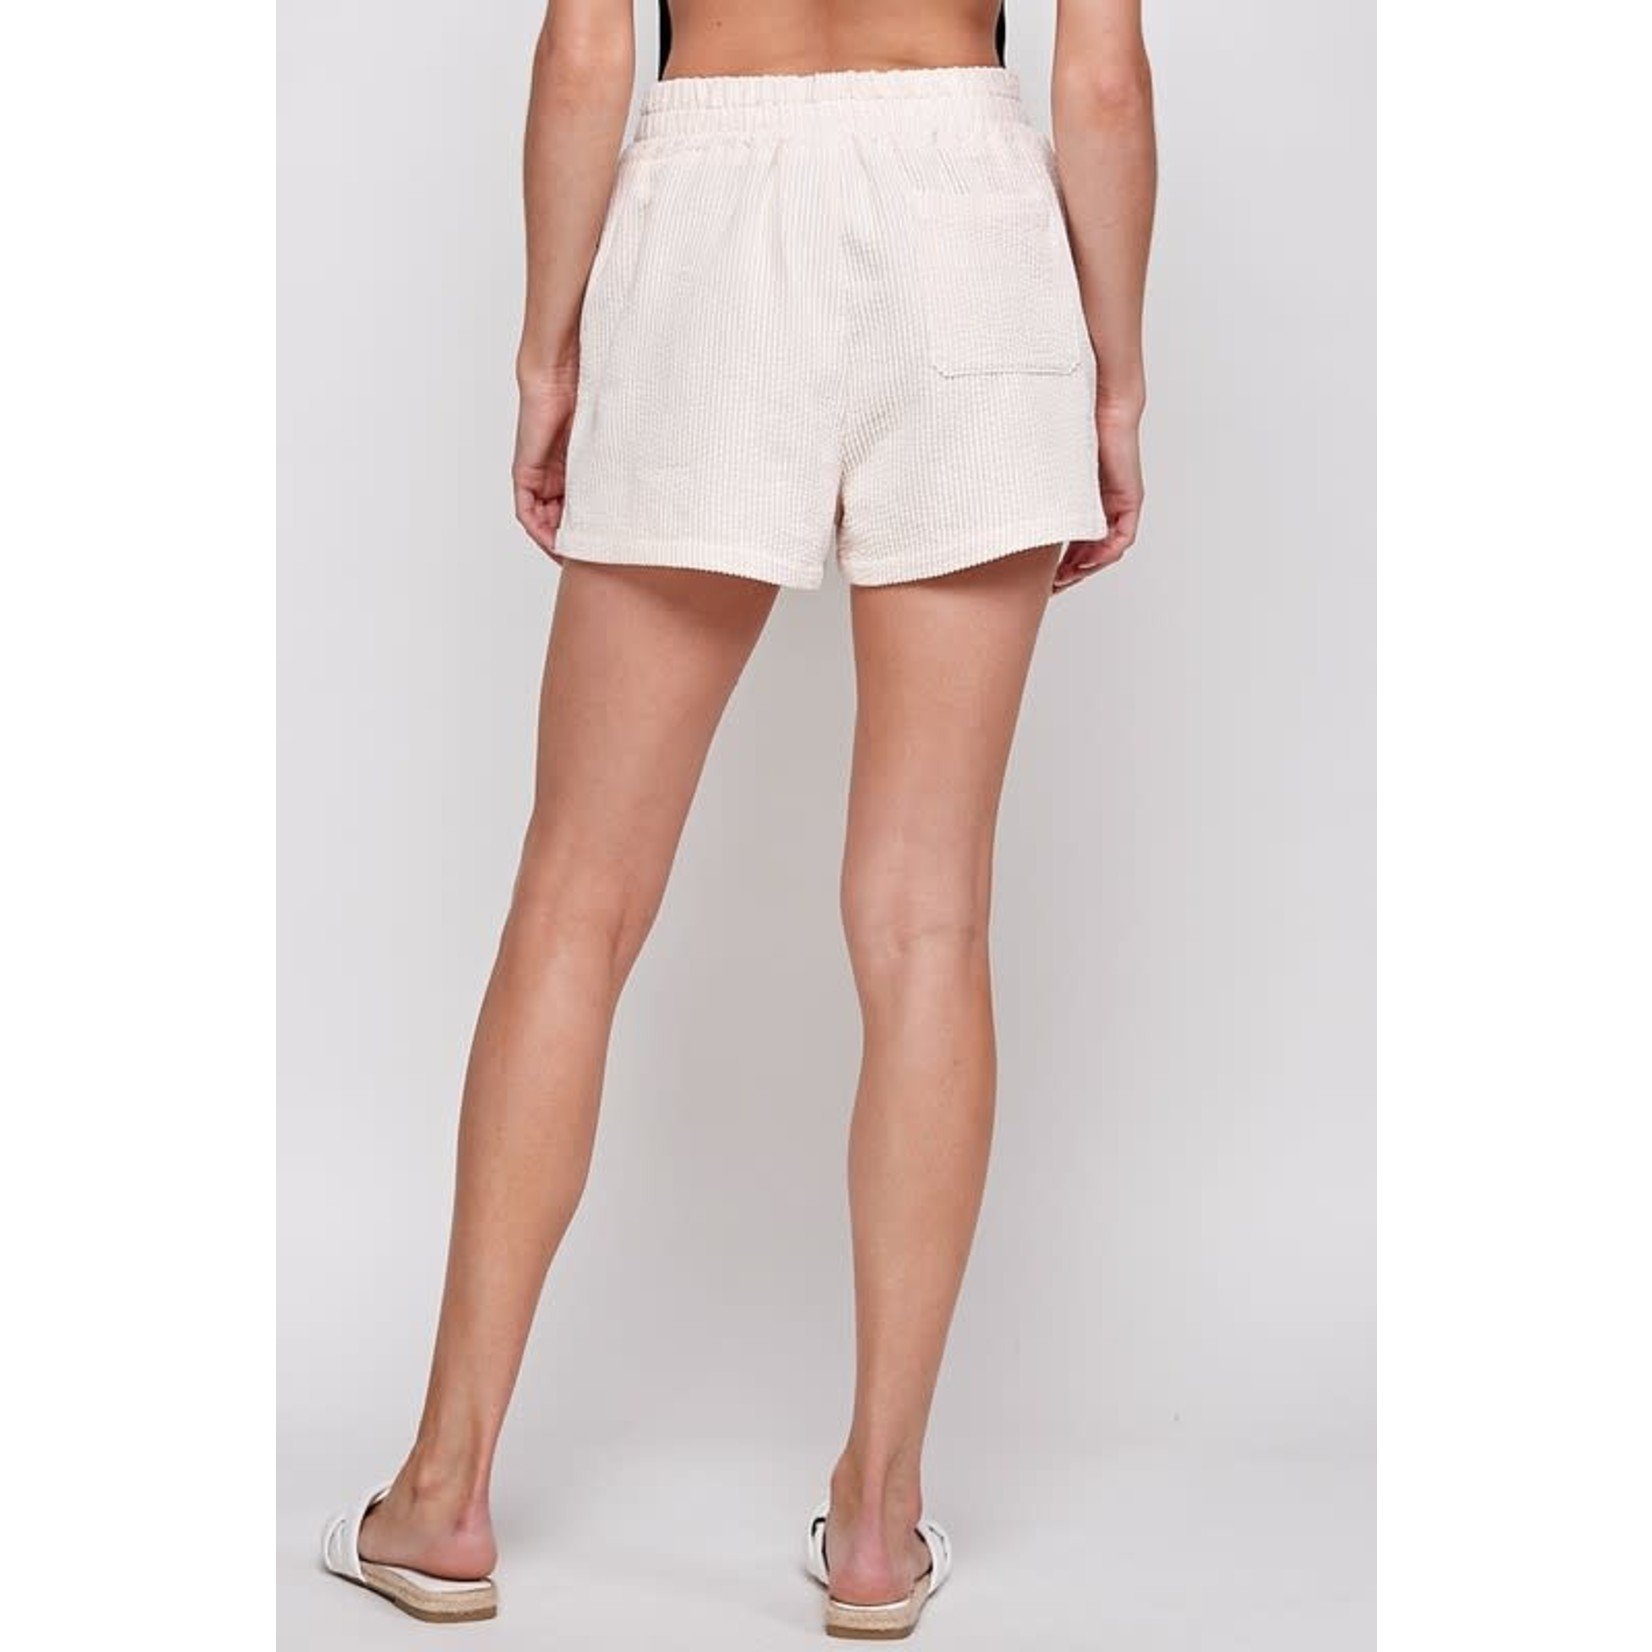 EM & ELLE Oakley Corduroy Shorts